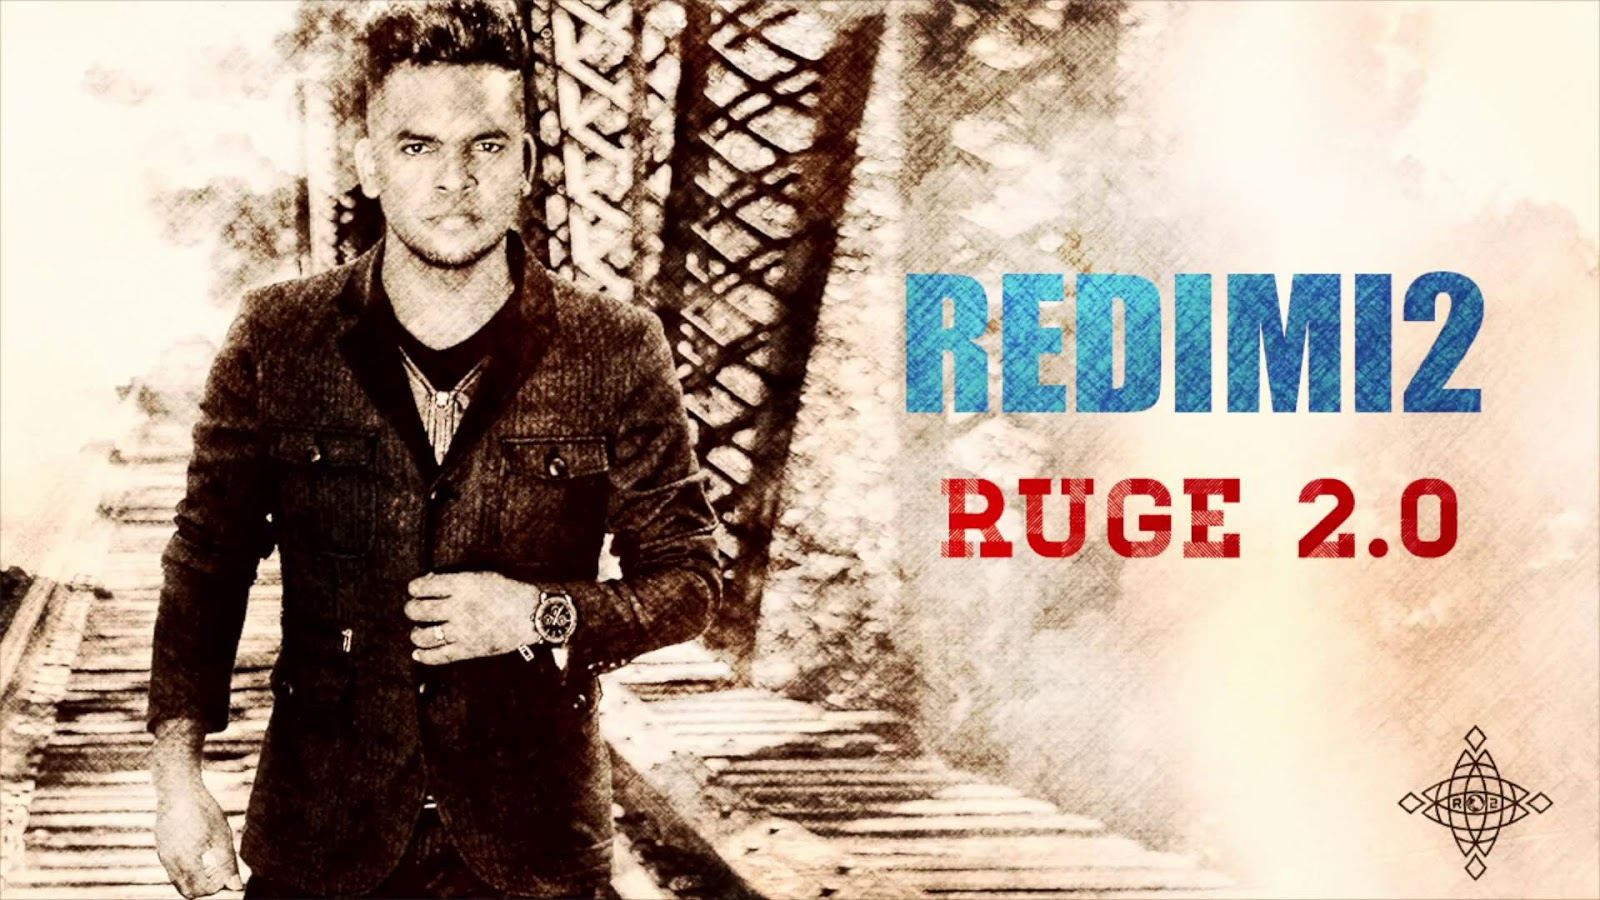 Redimi2 Ruge 2.0